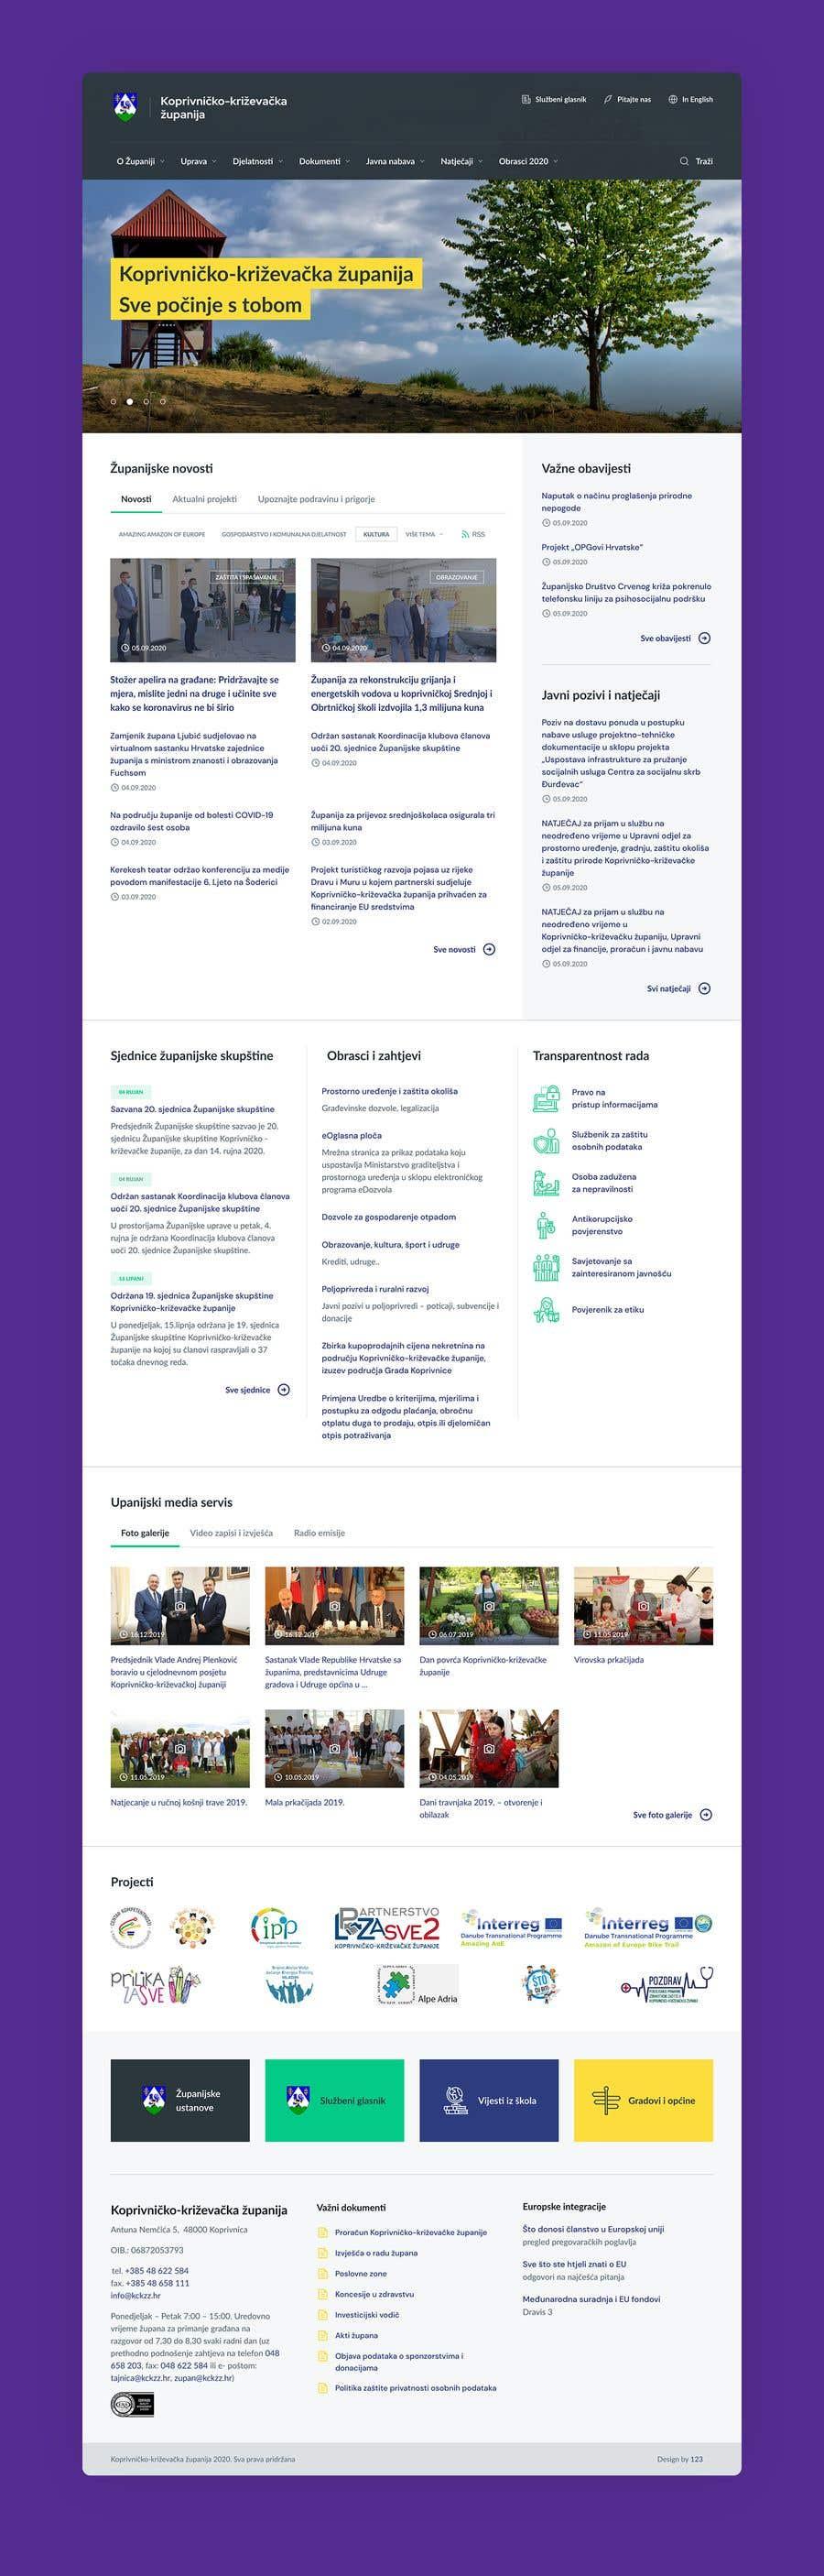 Penyertaan Peraduan #                                        27                                      untuk                                         Home page redesign project